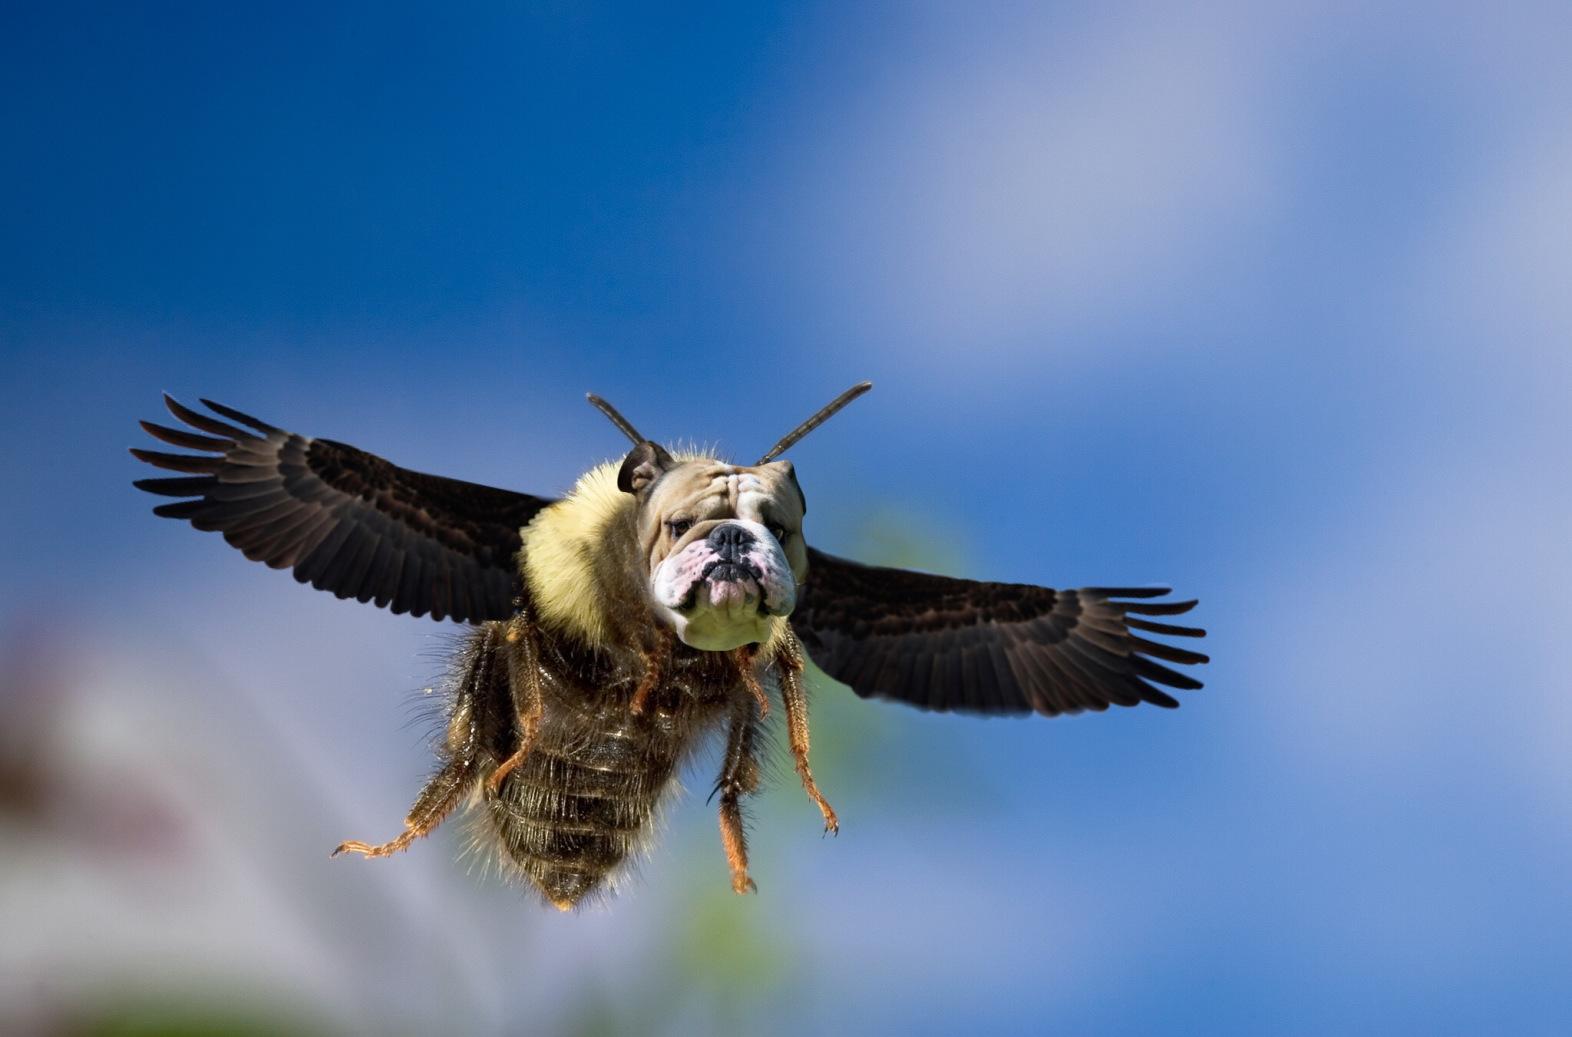 Bumblebee (Bombus sp) flying, Deschutes National Forest, Oregon